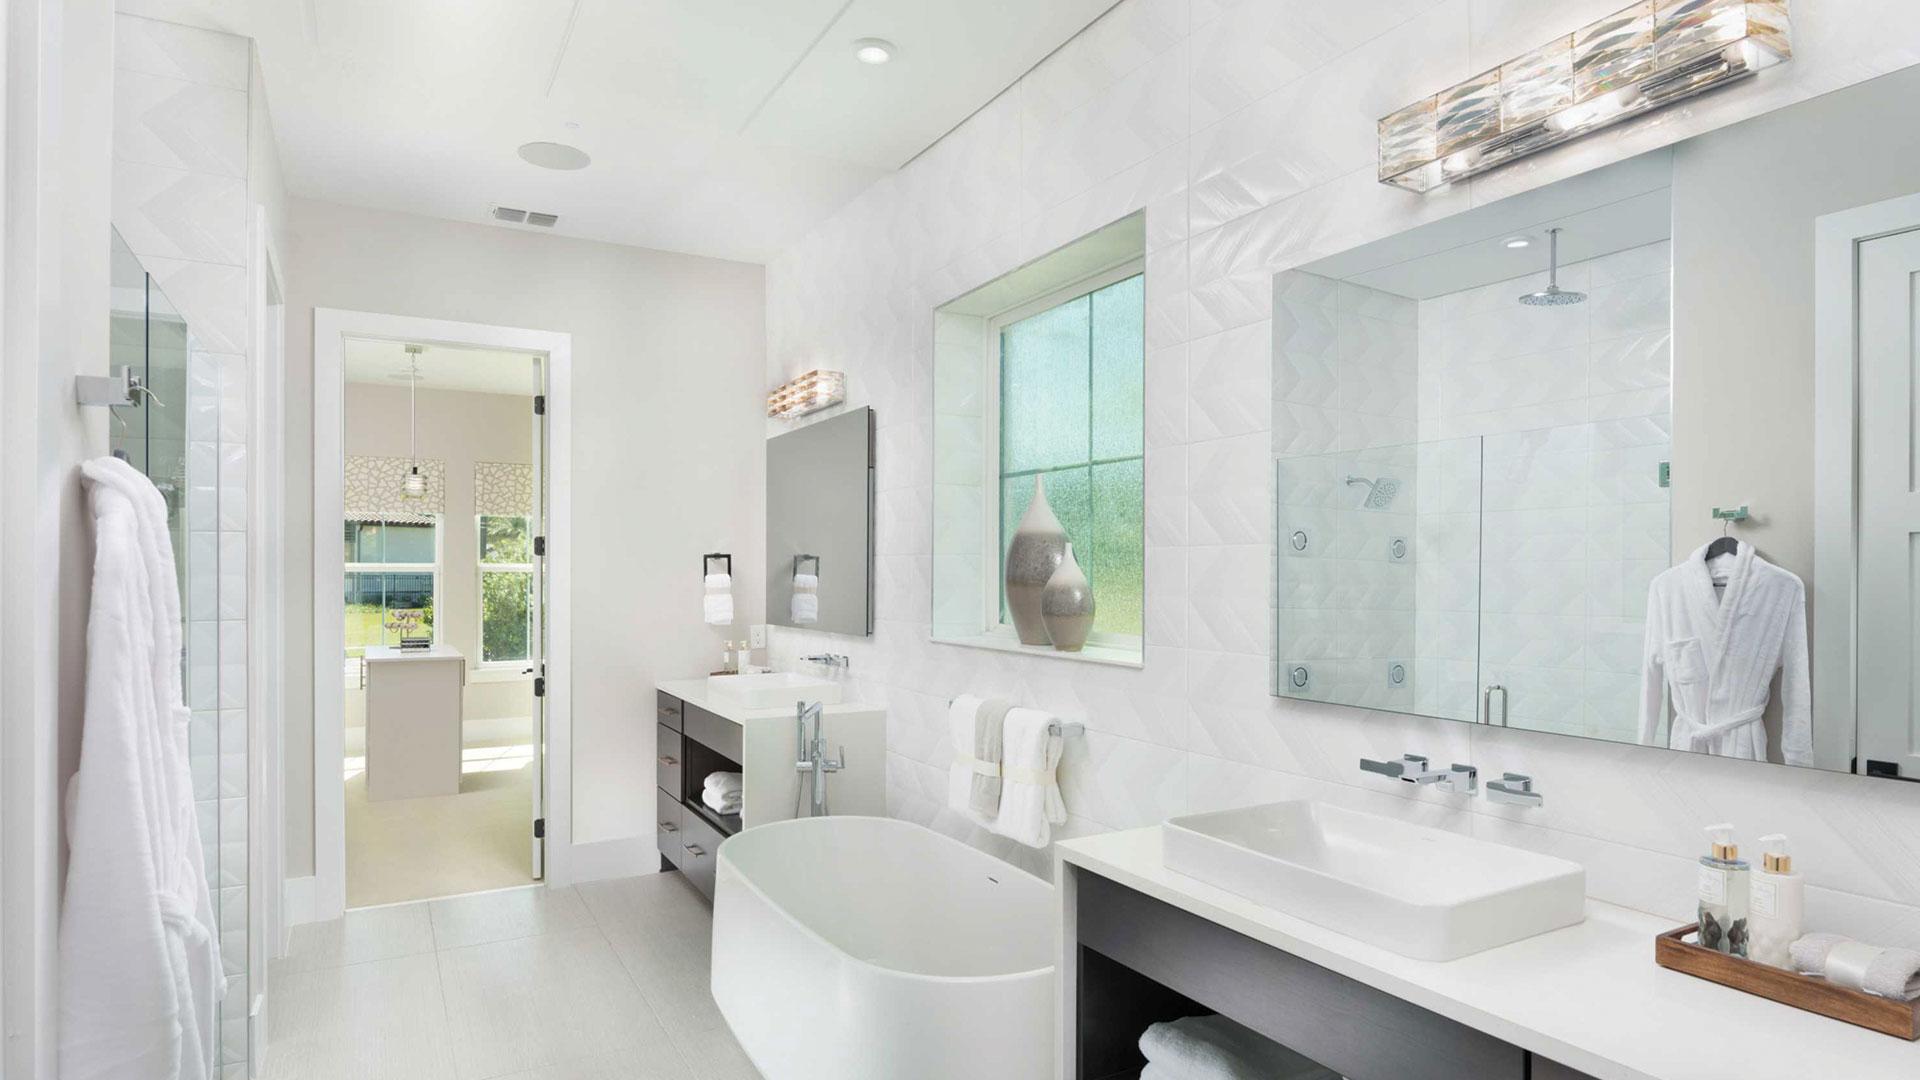 10 Bathroom Lighting Ideas to Brighten Your Space - Galleria Lighting